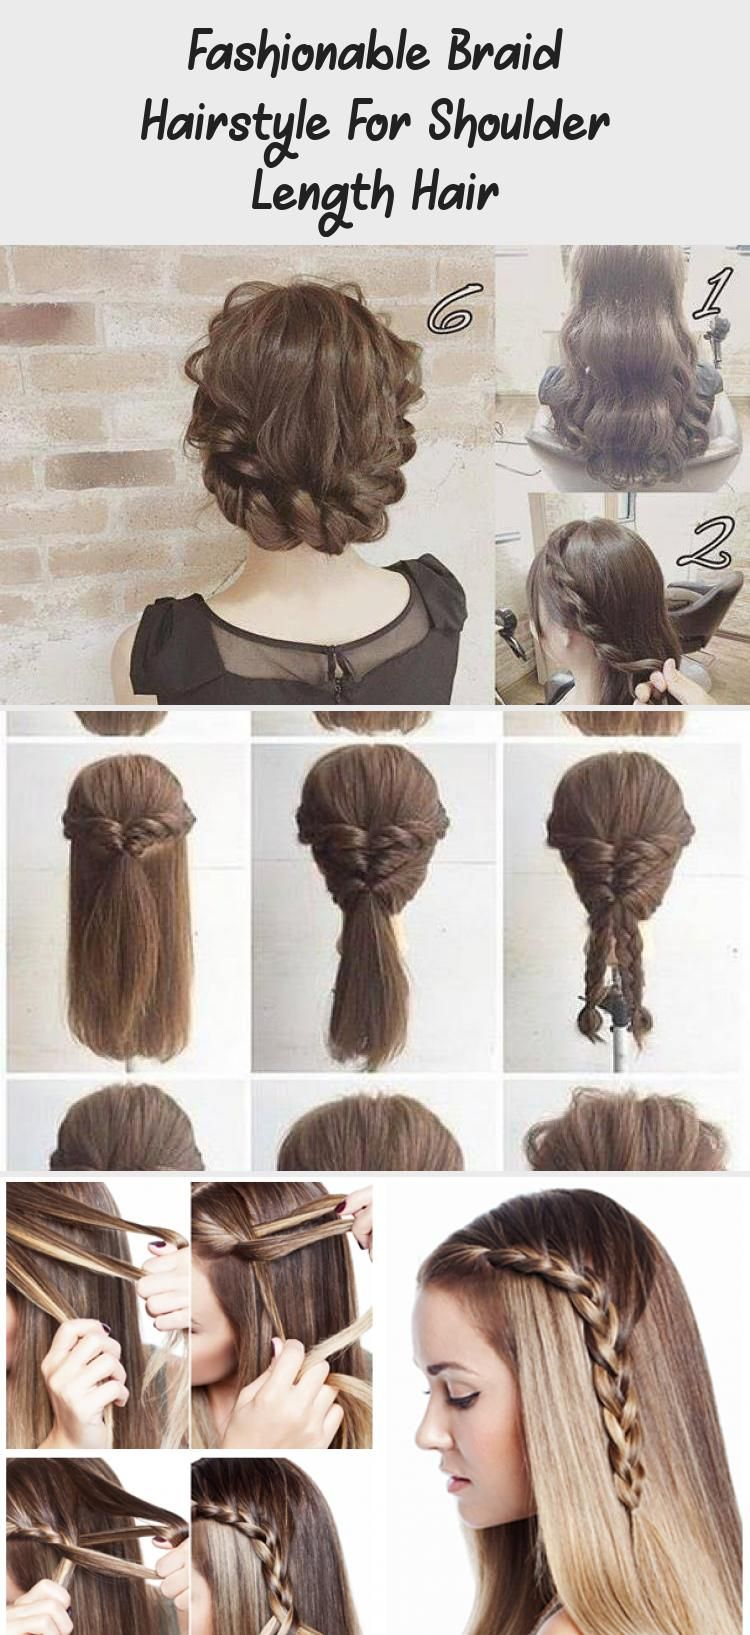 Fashionable Braid Hairstyle For Shoulder Length Hair Arianagrandehairtutorial Hairtutorialeasy Hairtuto In 2020 Braided Hairstyles Shoulder Length Hair Hair Lengths